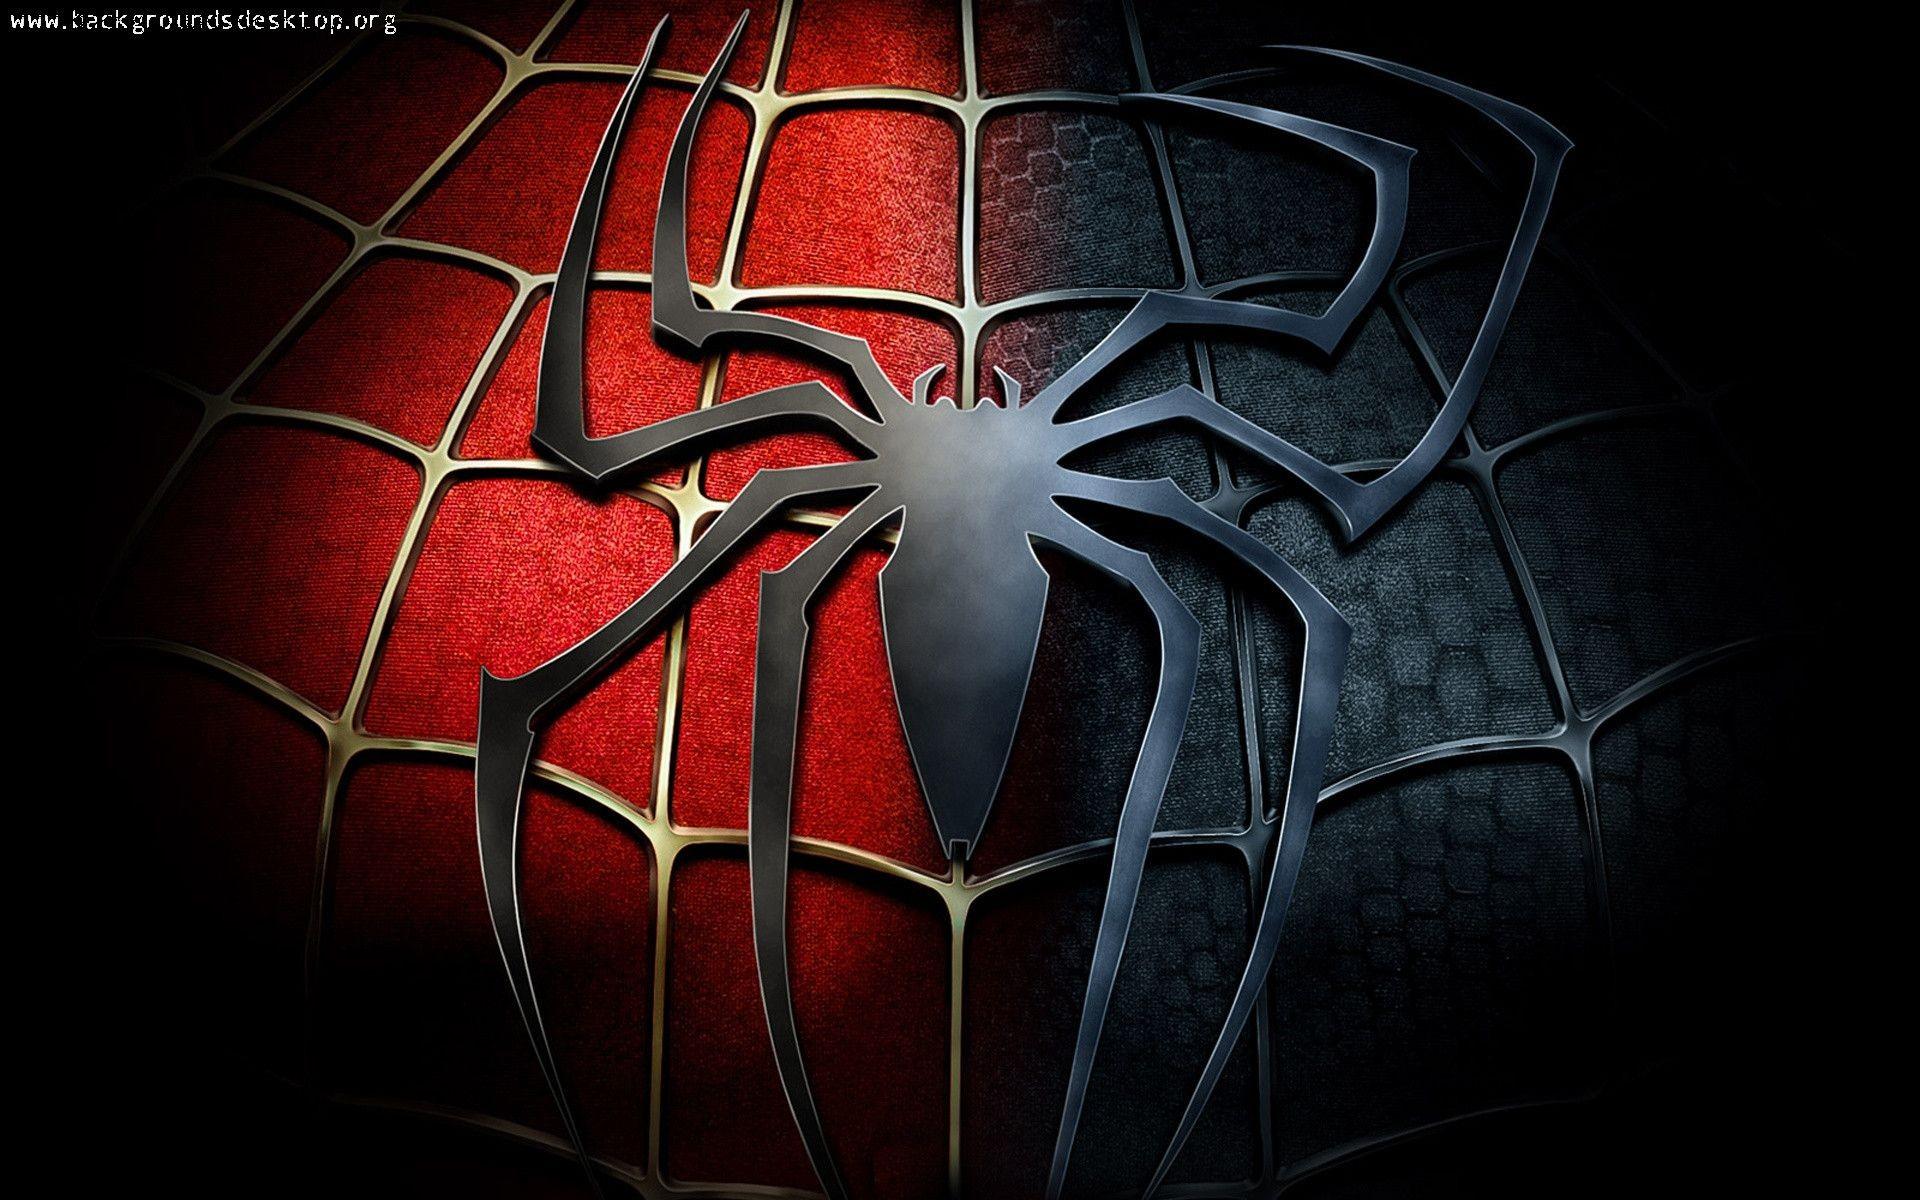 Amazing spider man logo wallpaper - photo#36